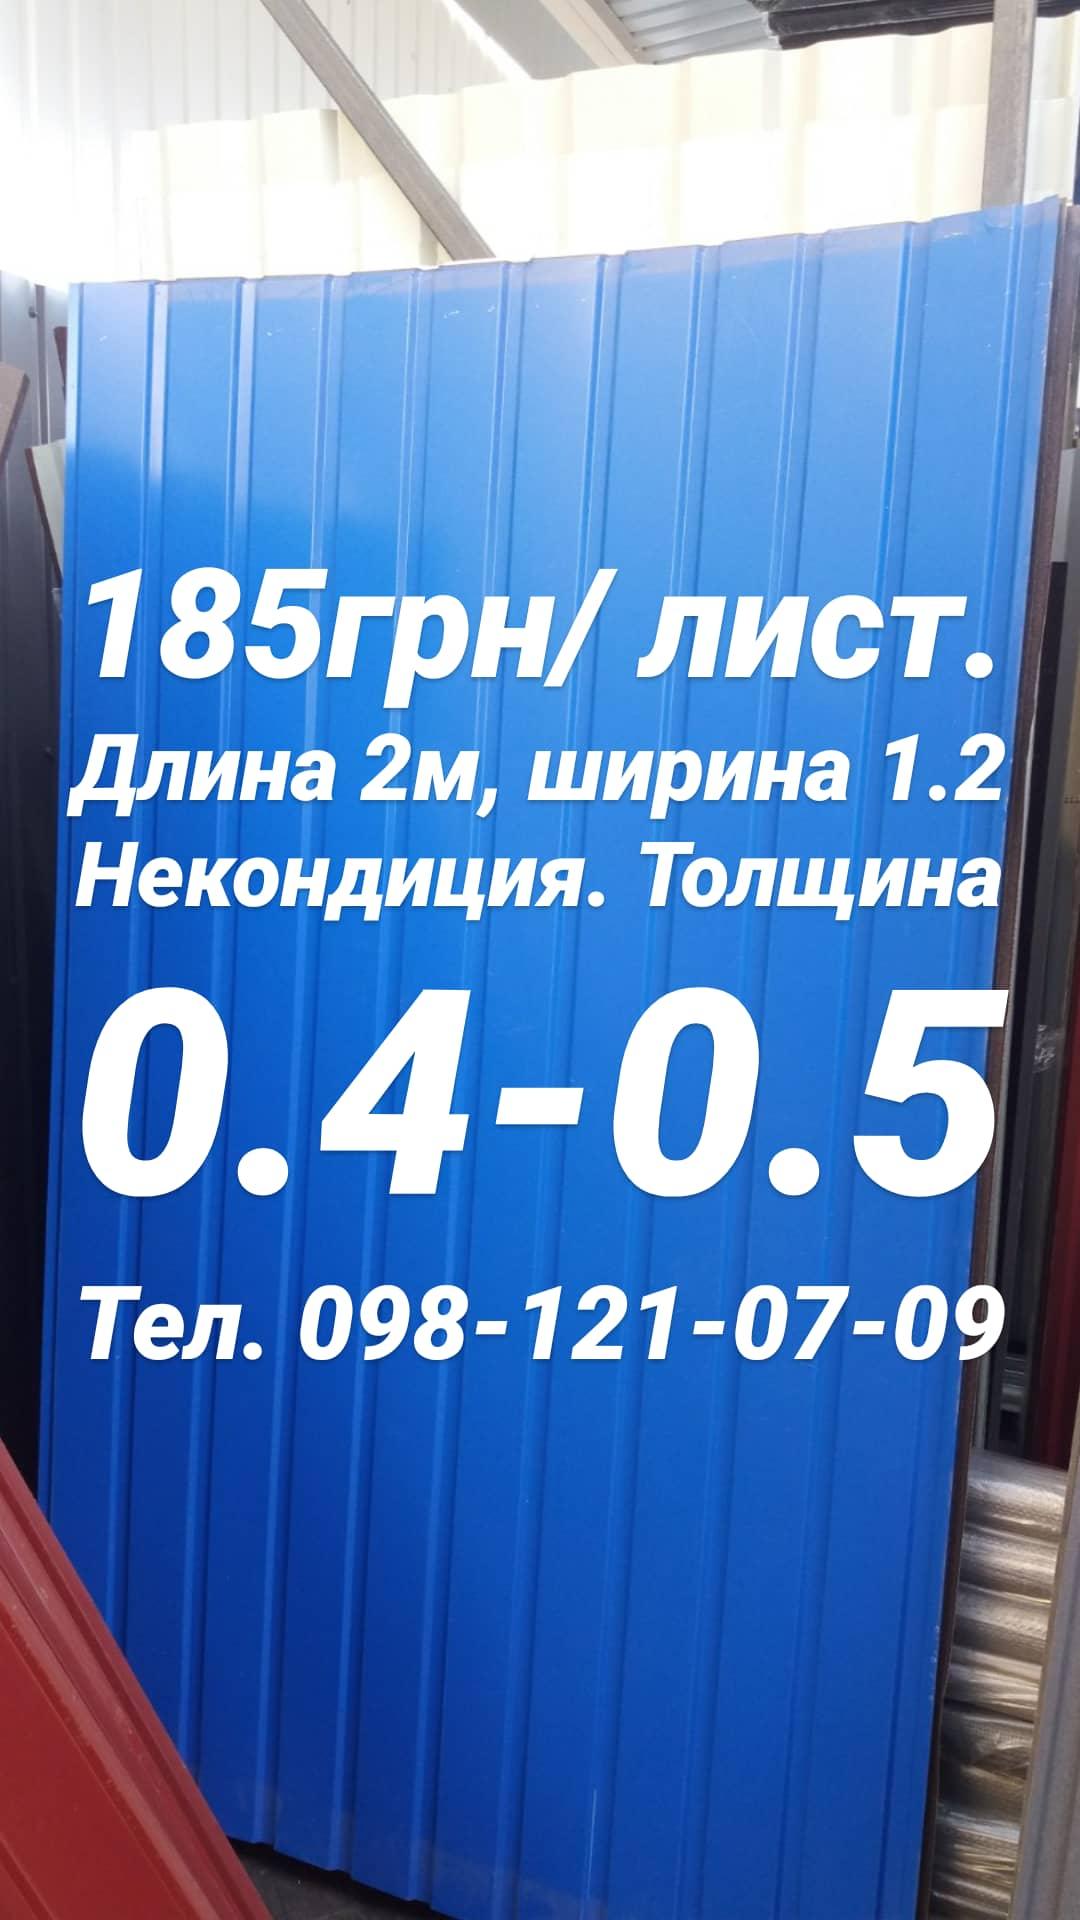 IMG_20200220_091603_306